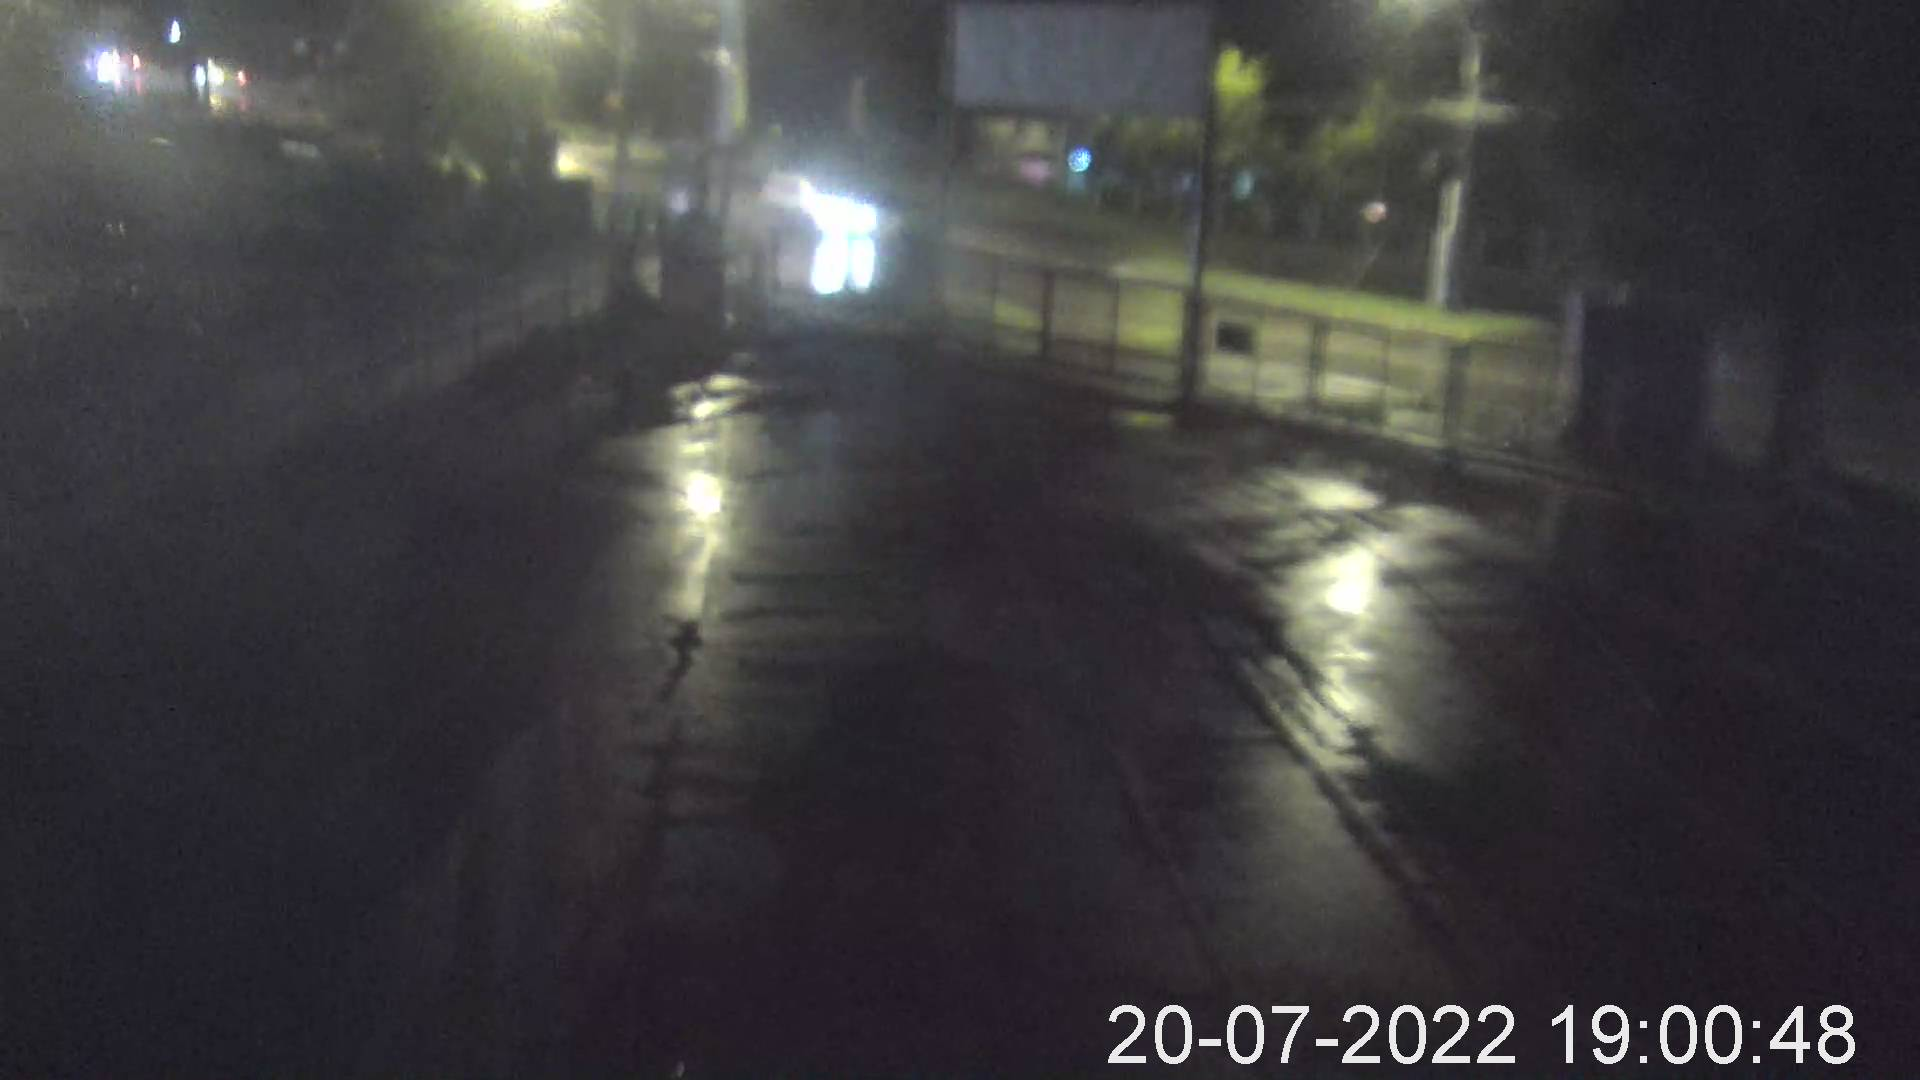 Planta de Revisión Técnica en Villarrica